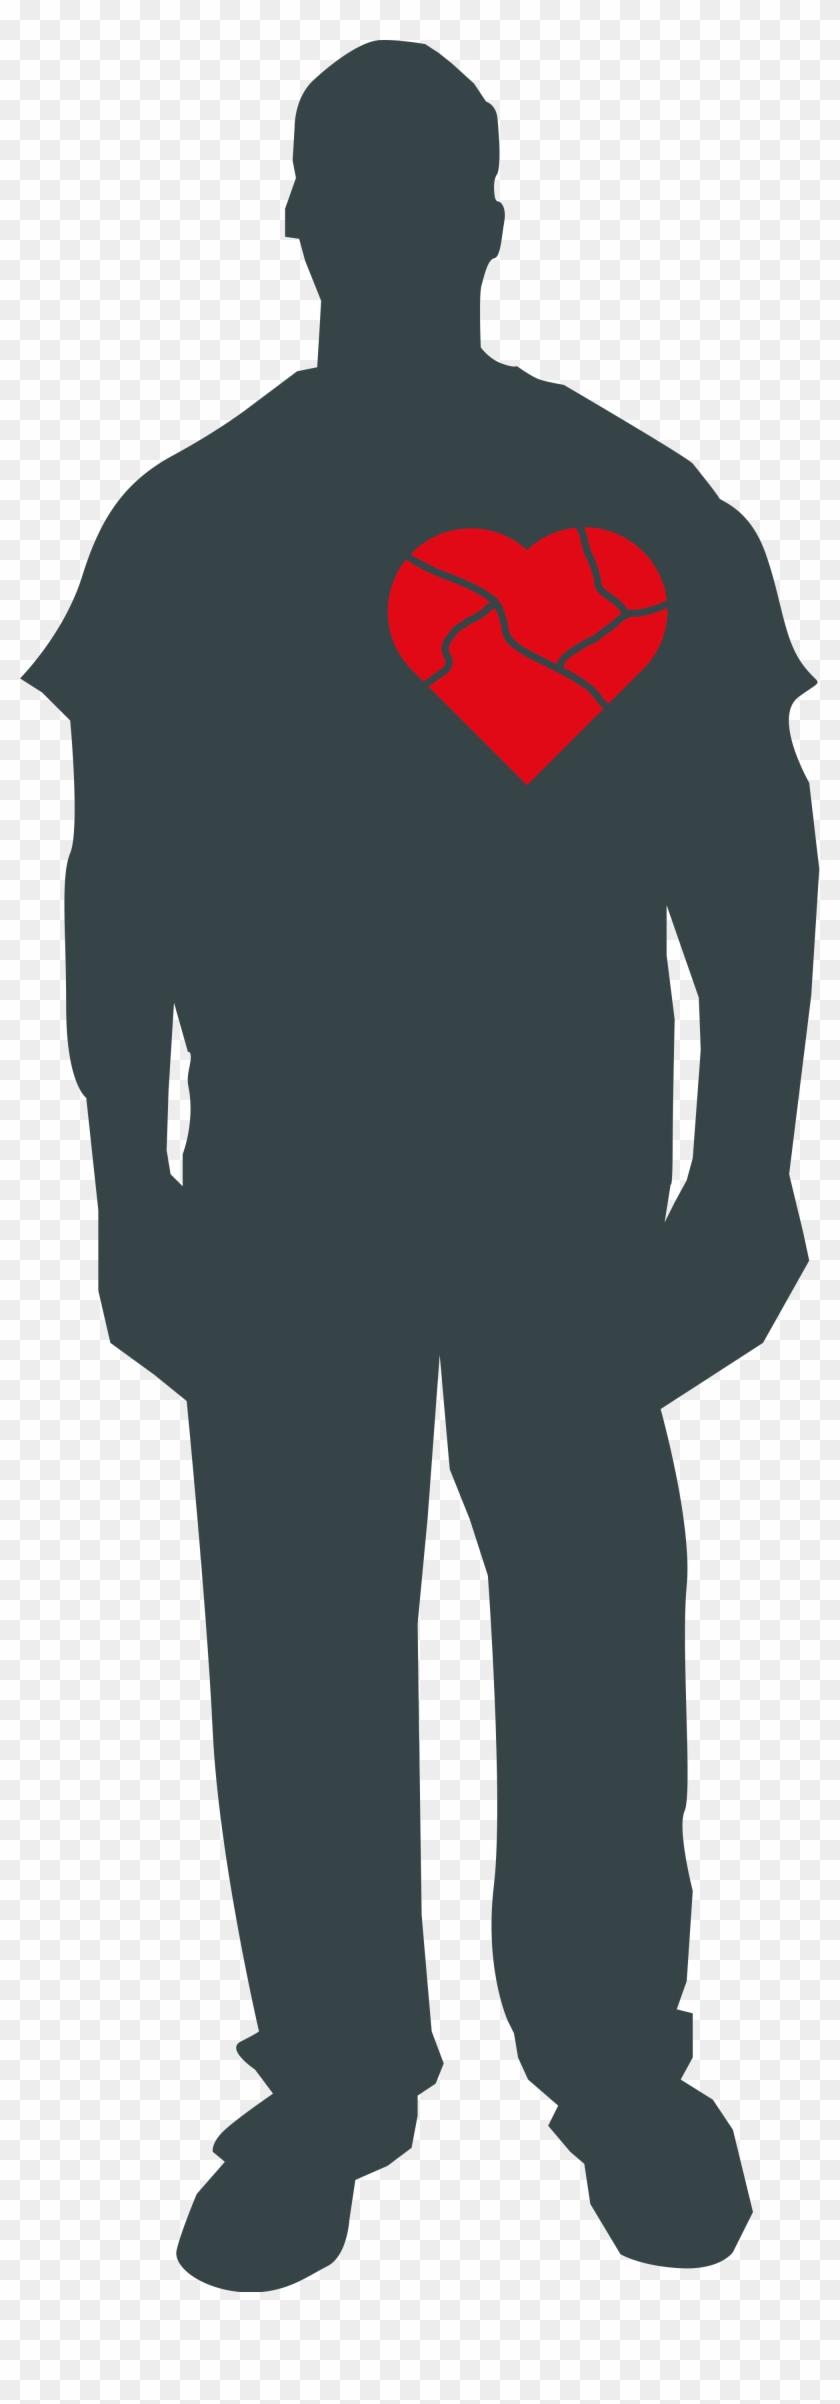 Broken Heart Clipart Outline - Person With Broken Heart - Png Download #798821